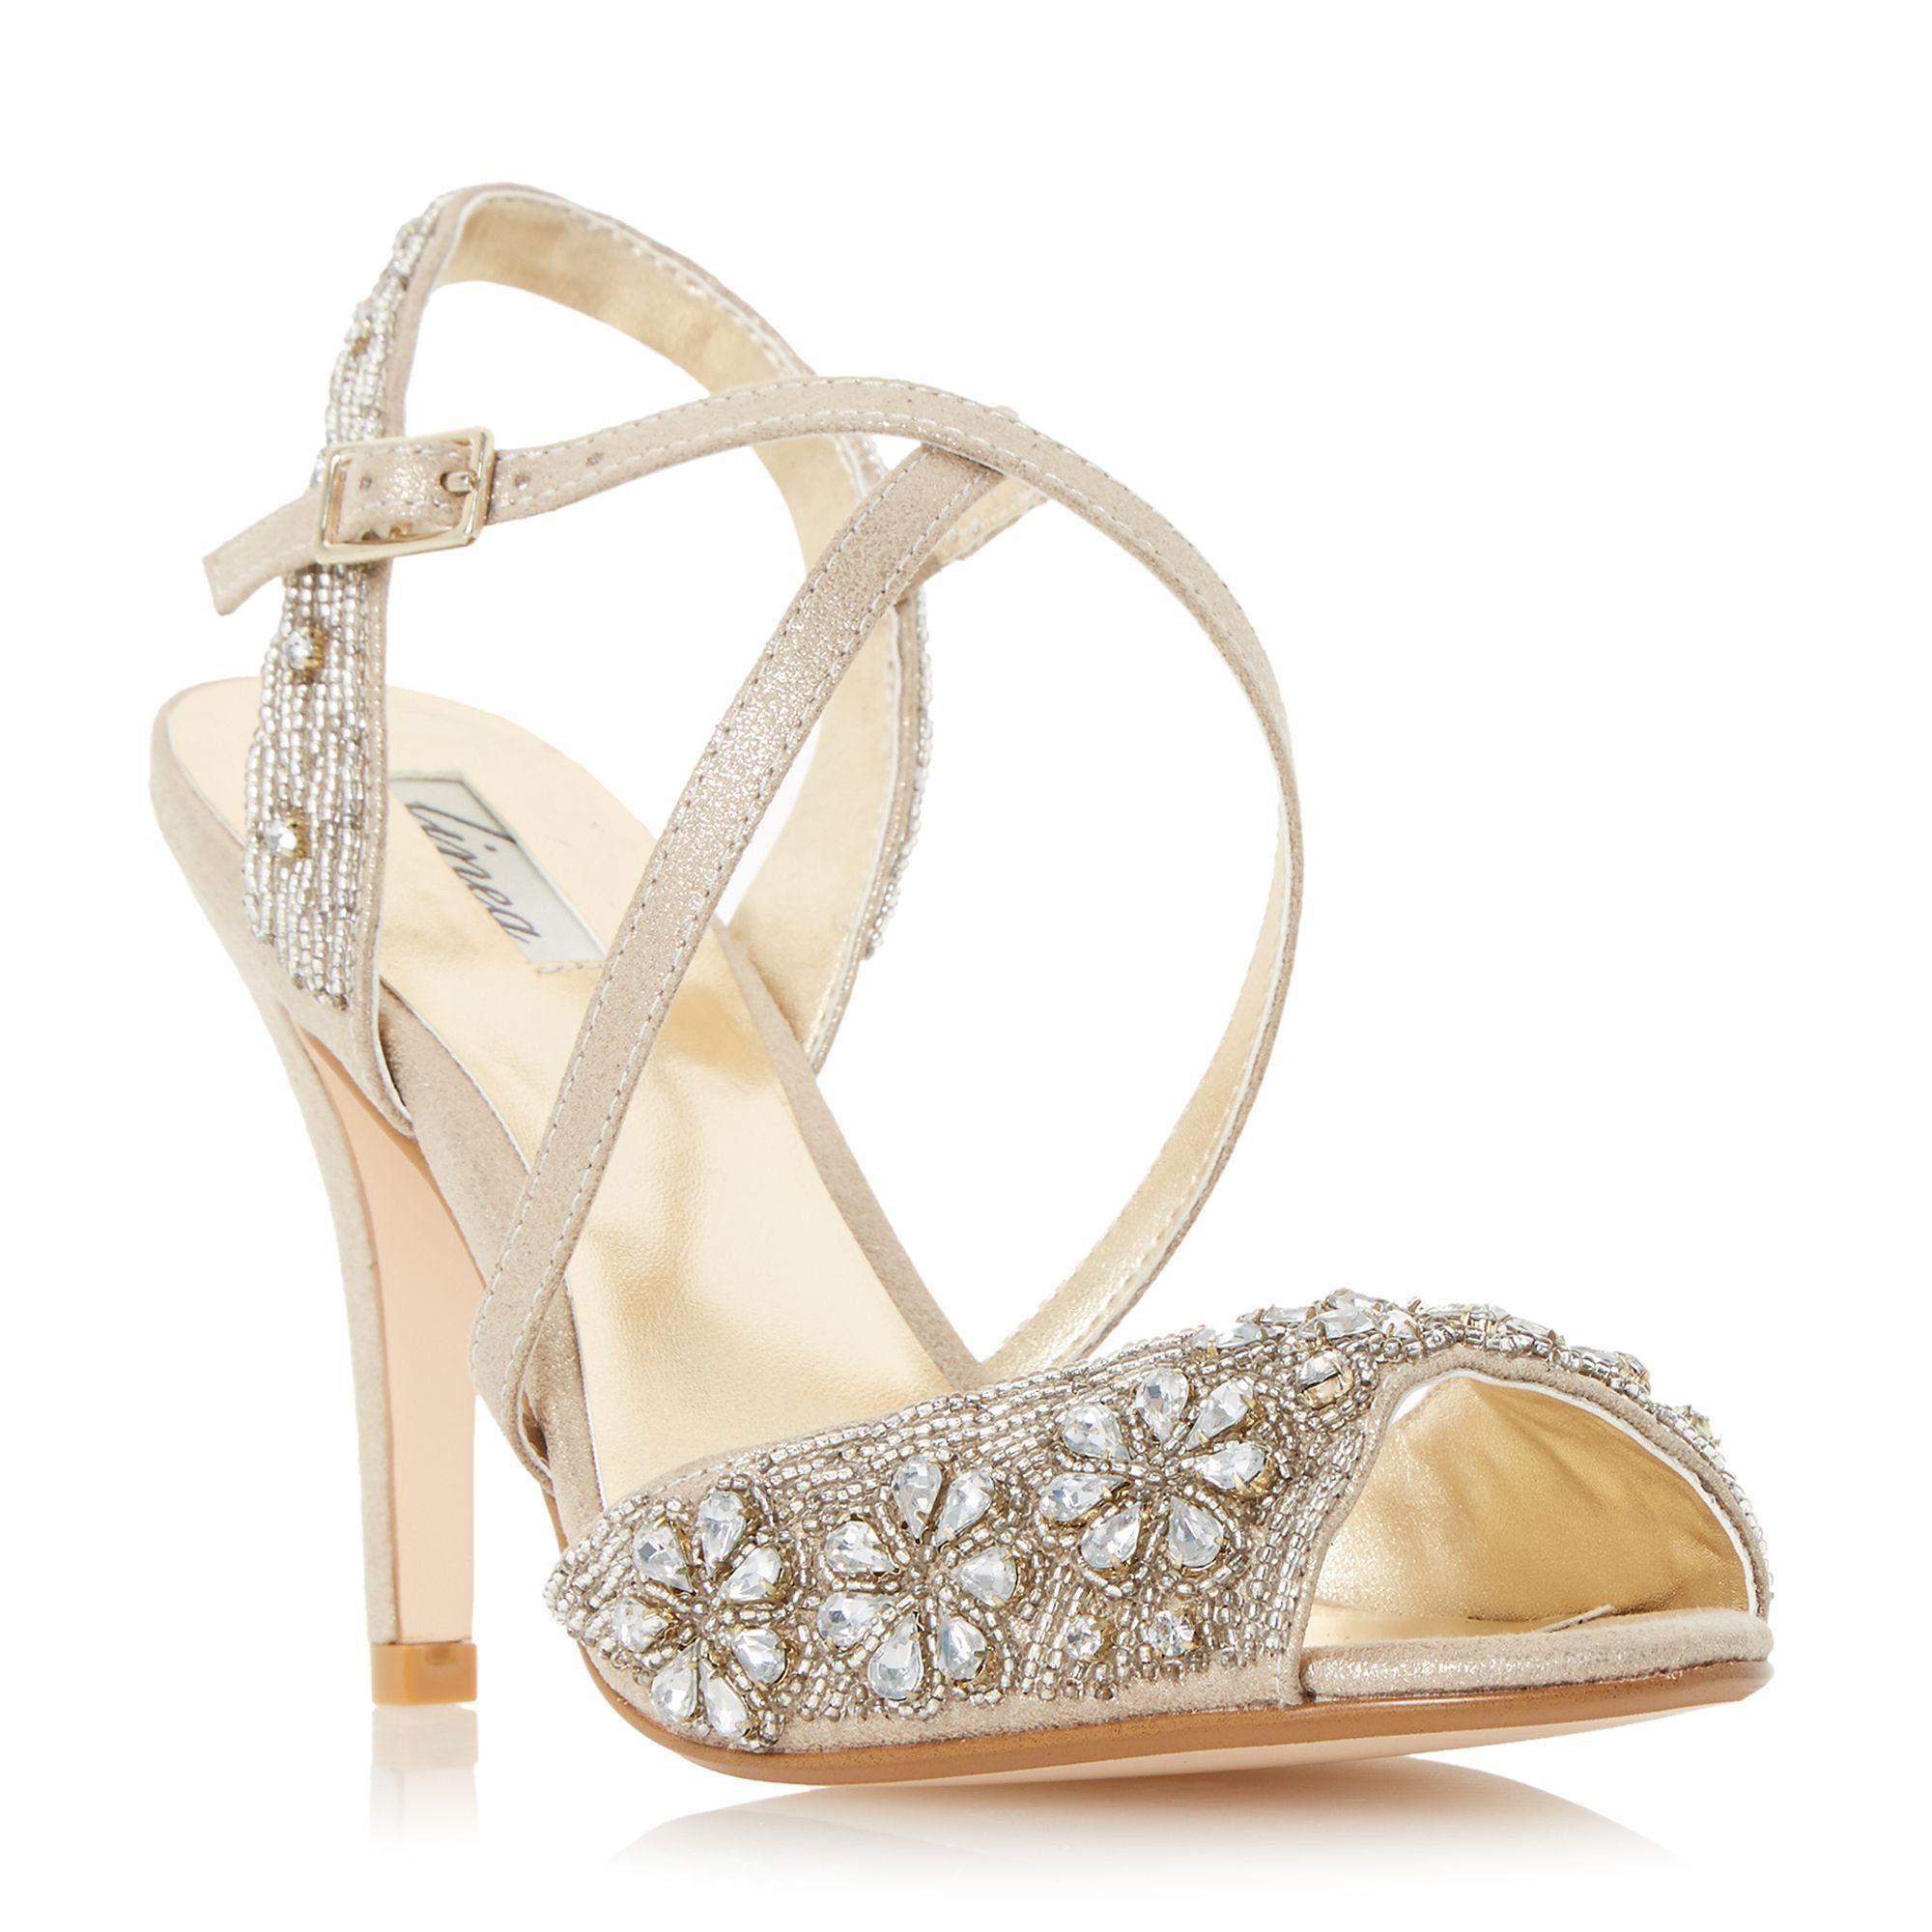 809f7d071f3 Linea Molana embellished cross strap high heel sandals, Gold ...